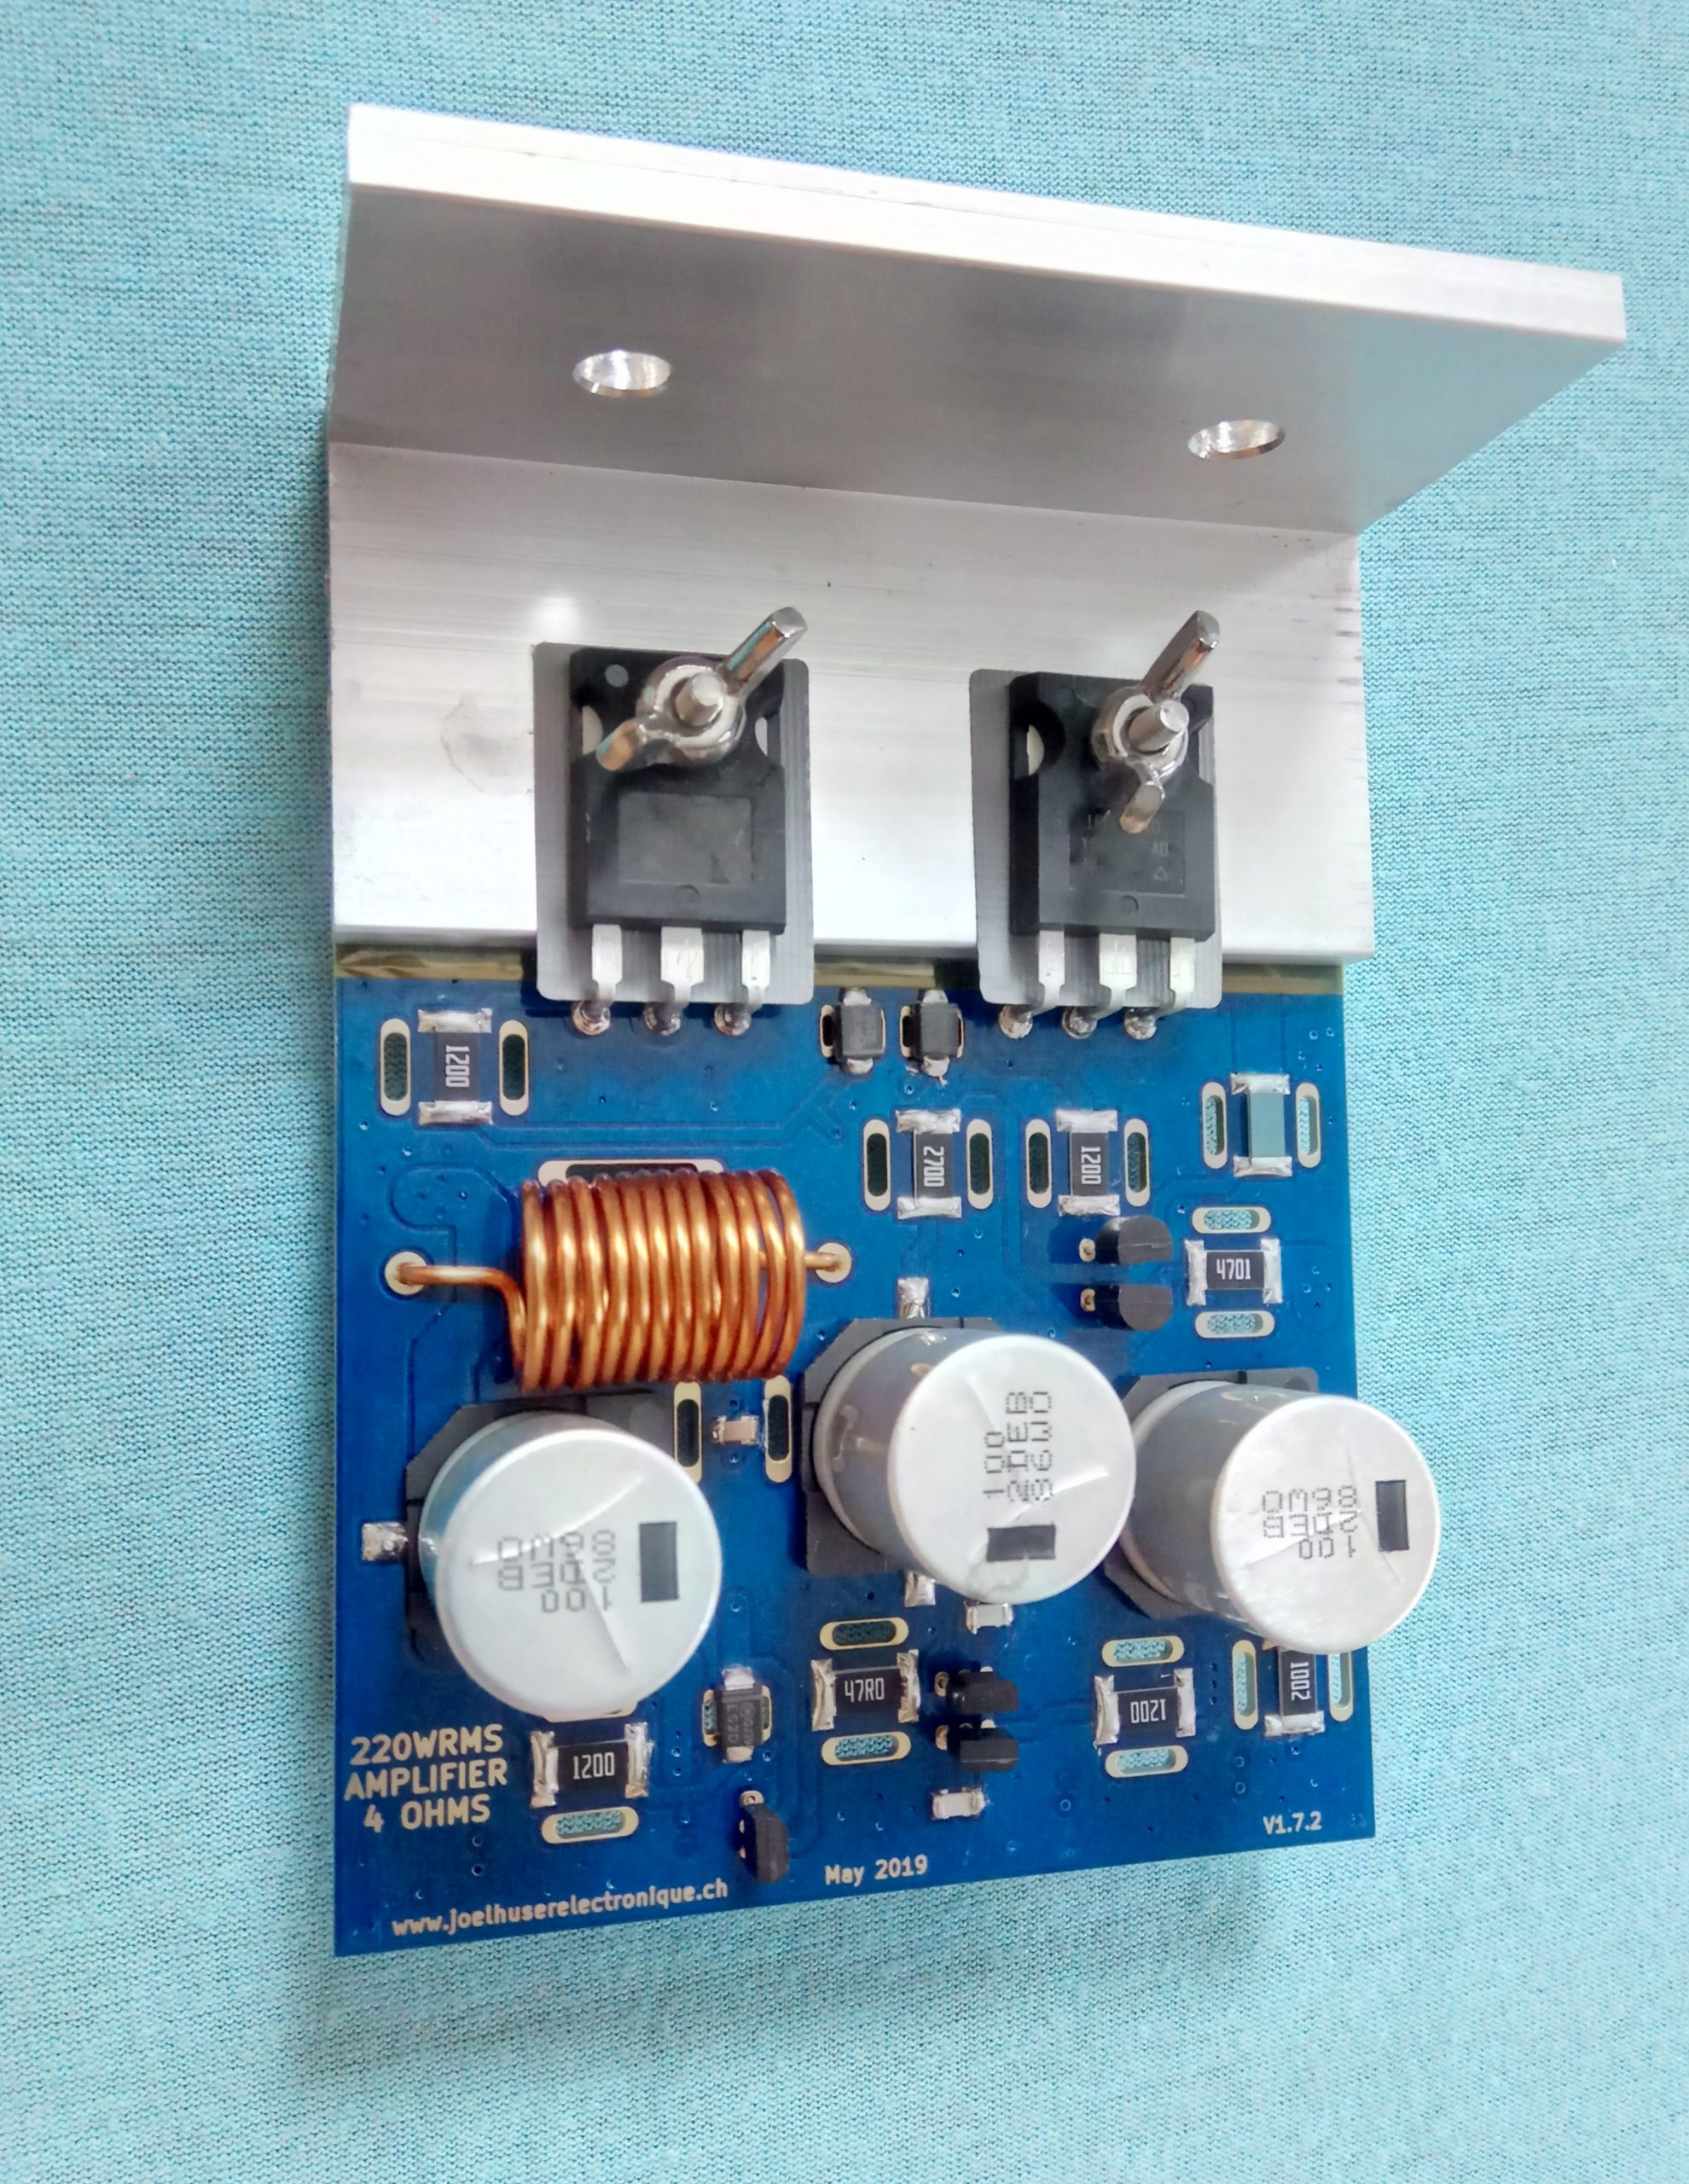 Measured 242WRMS on a 4 Ohms load audio amplifier core